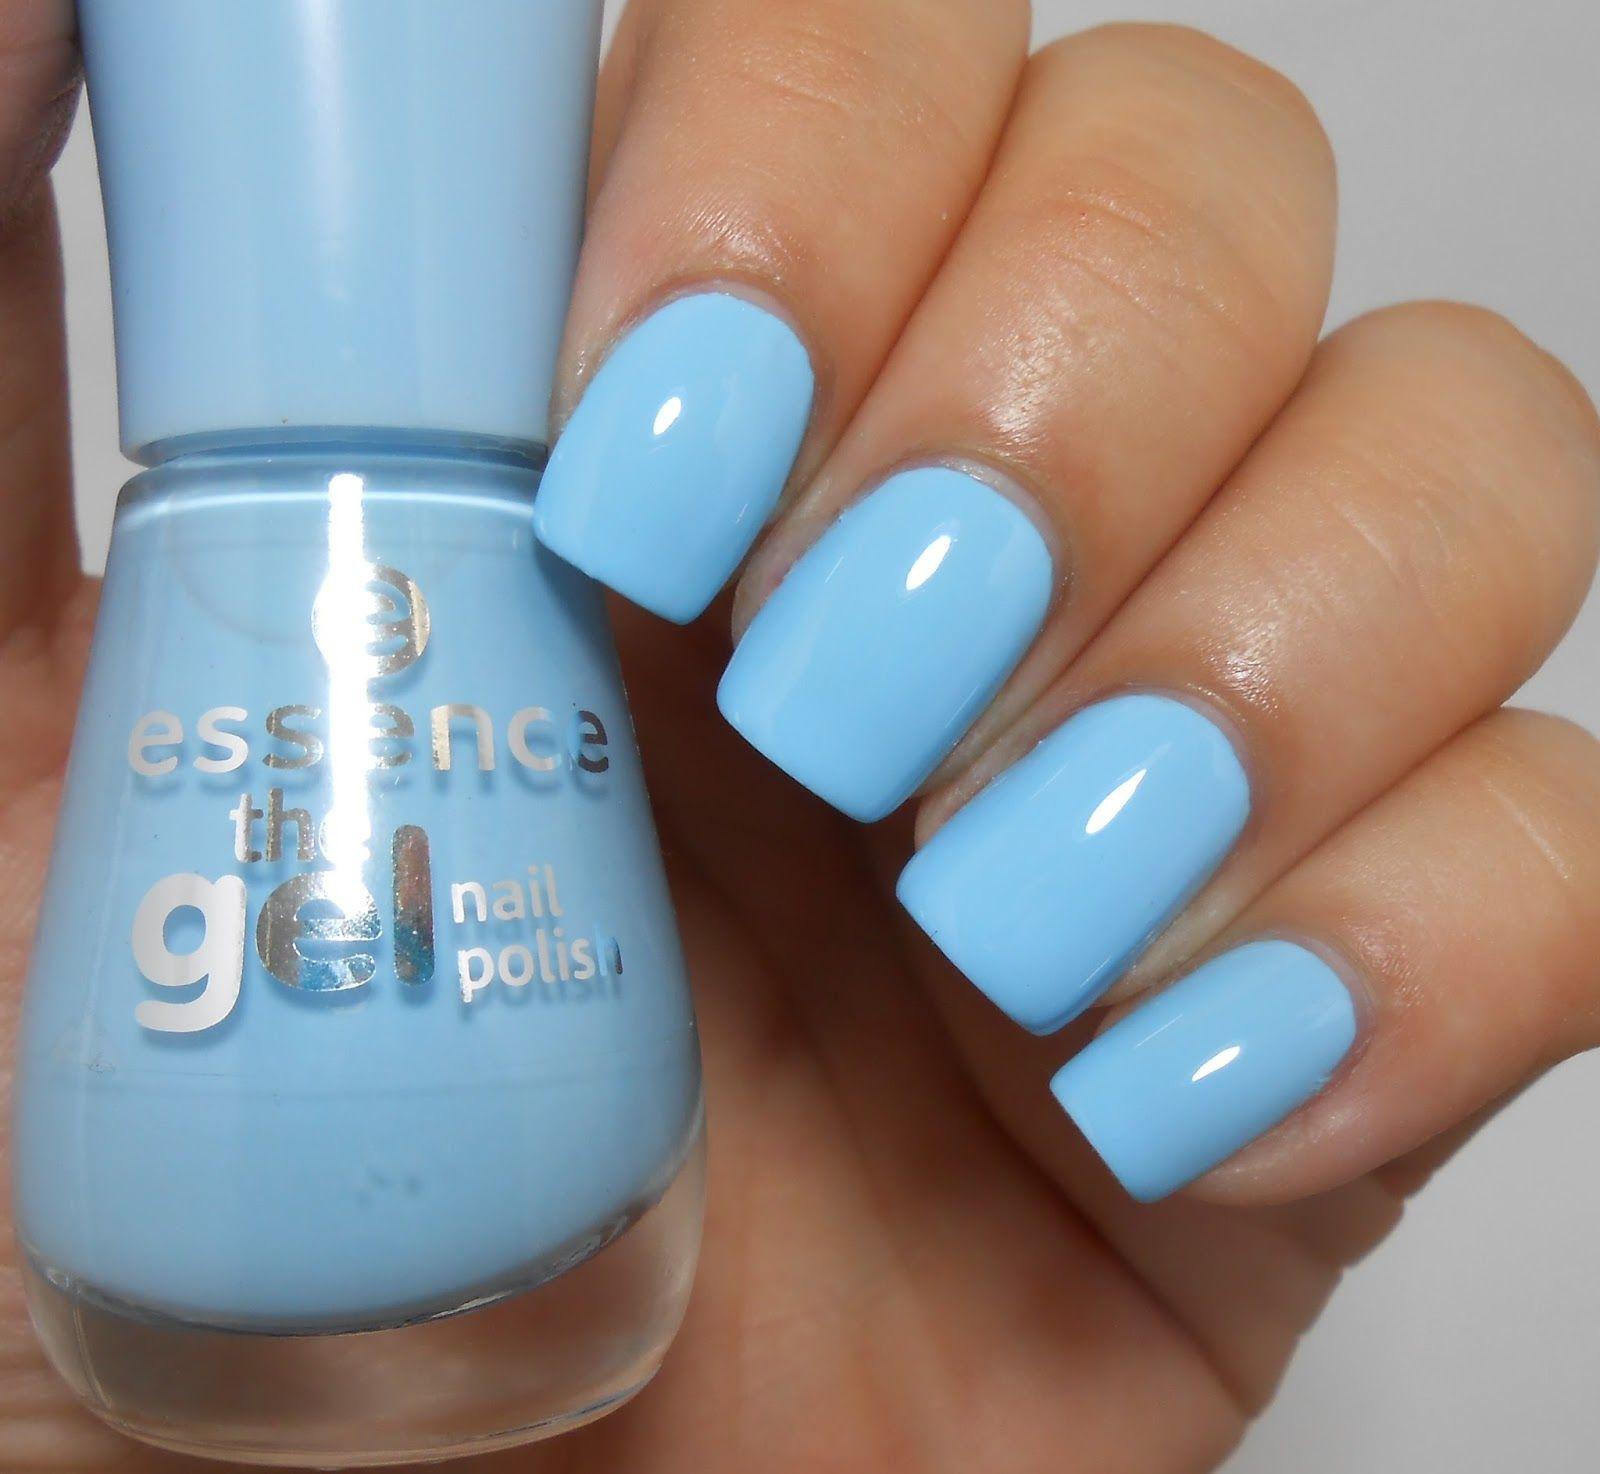 taya: swatches: essence the gel nail polish part 2 | my stuff